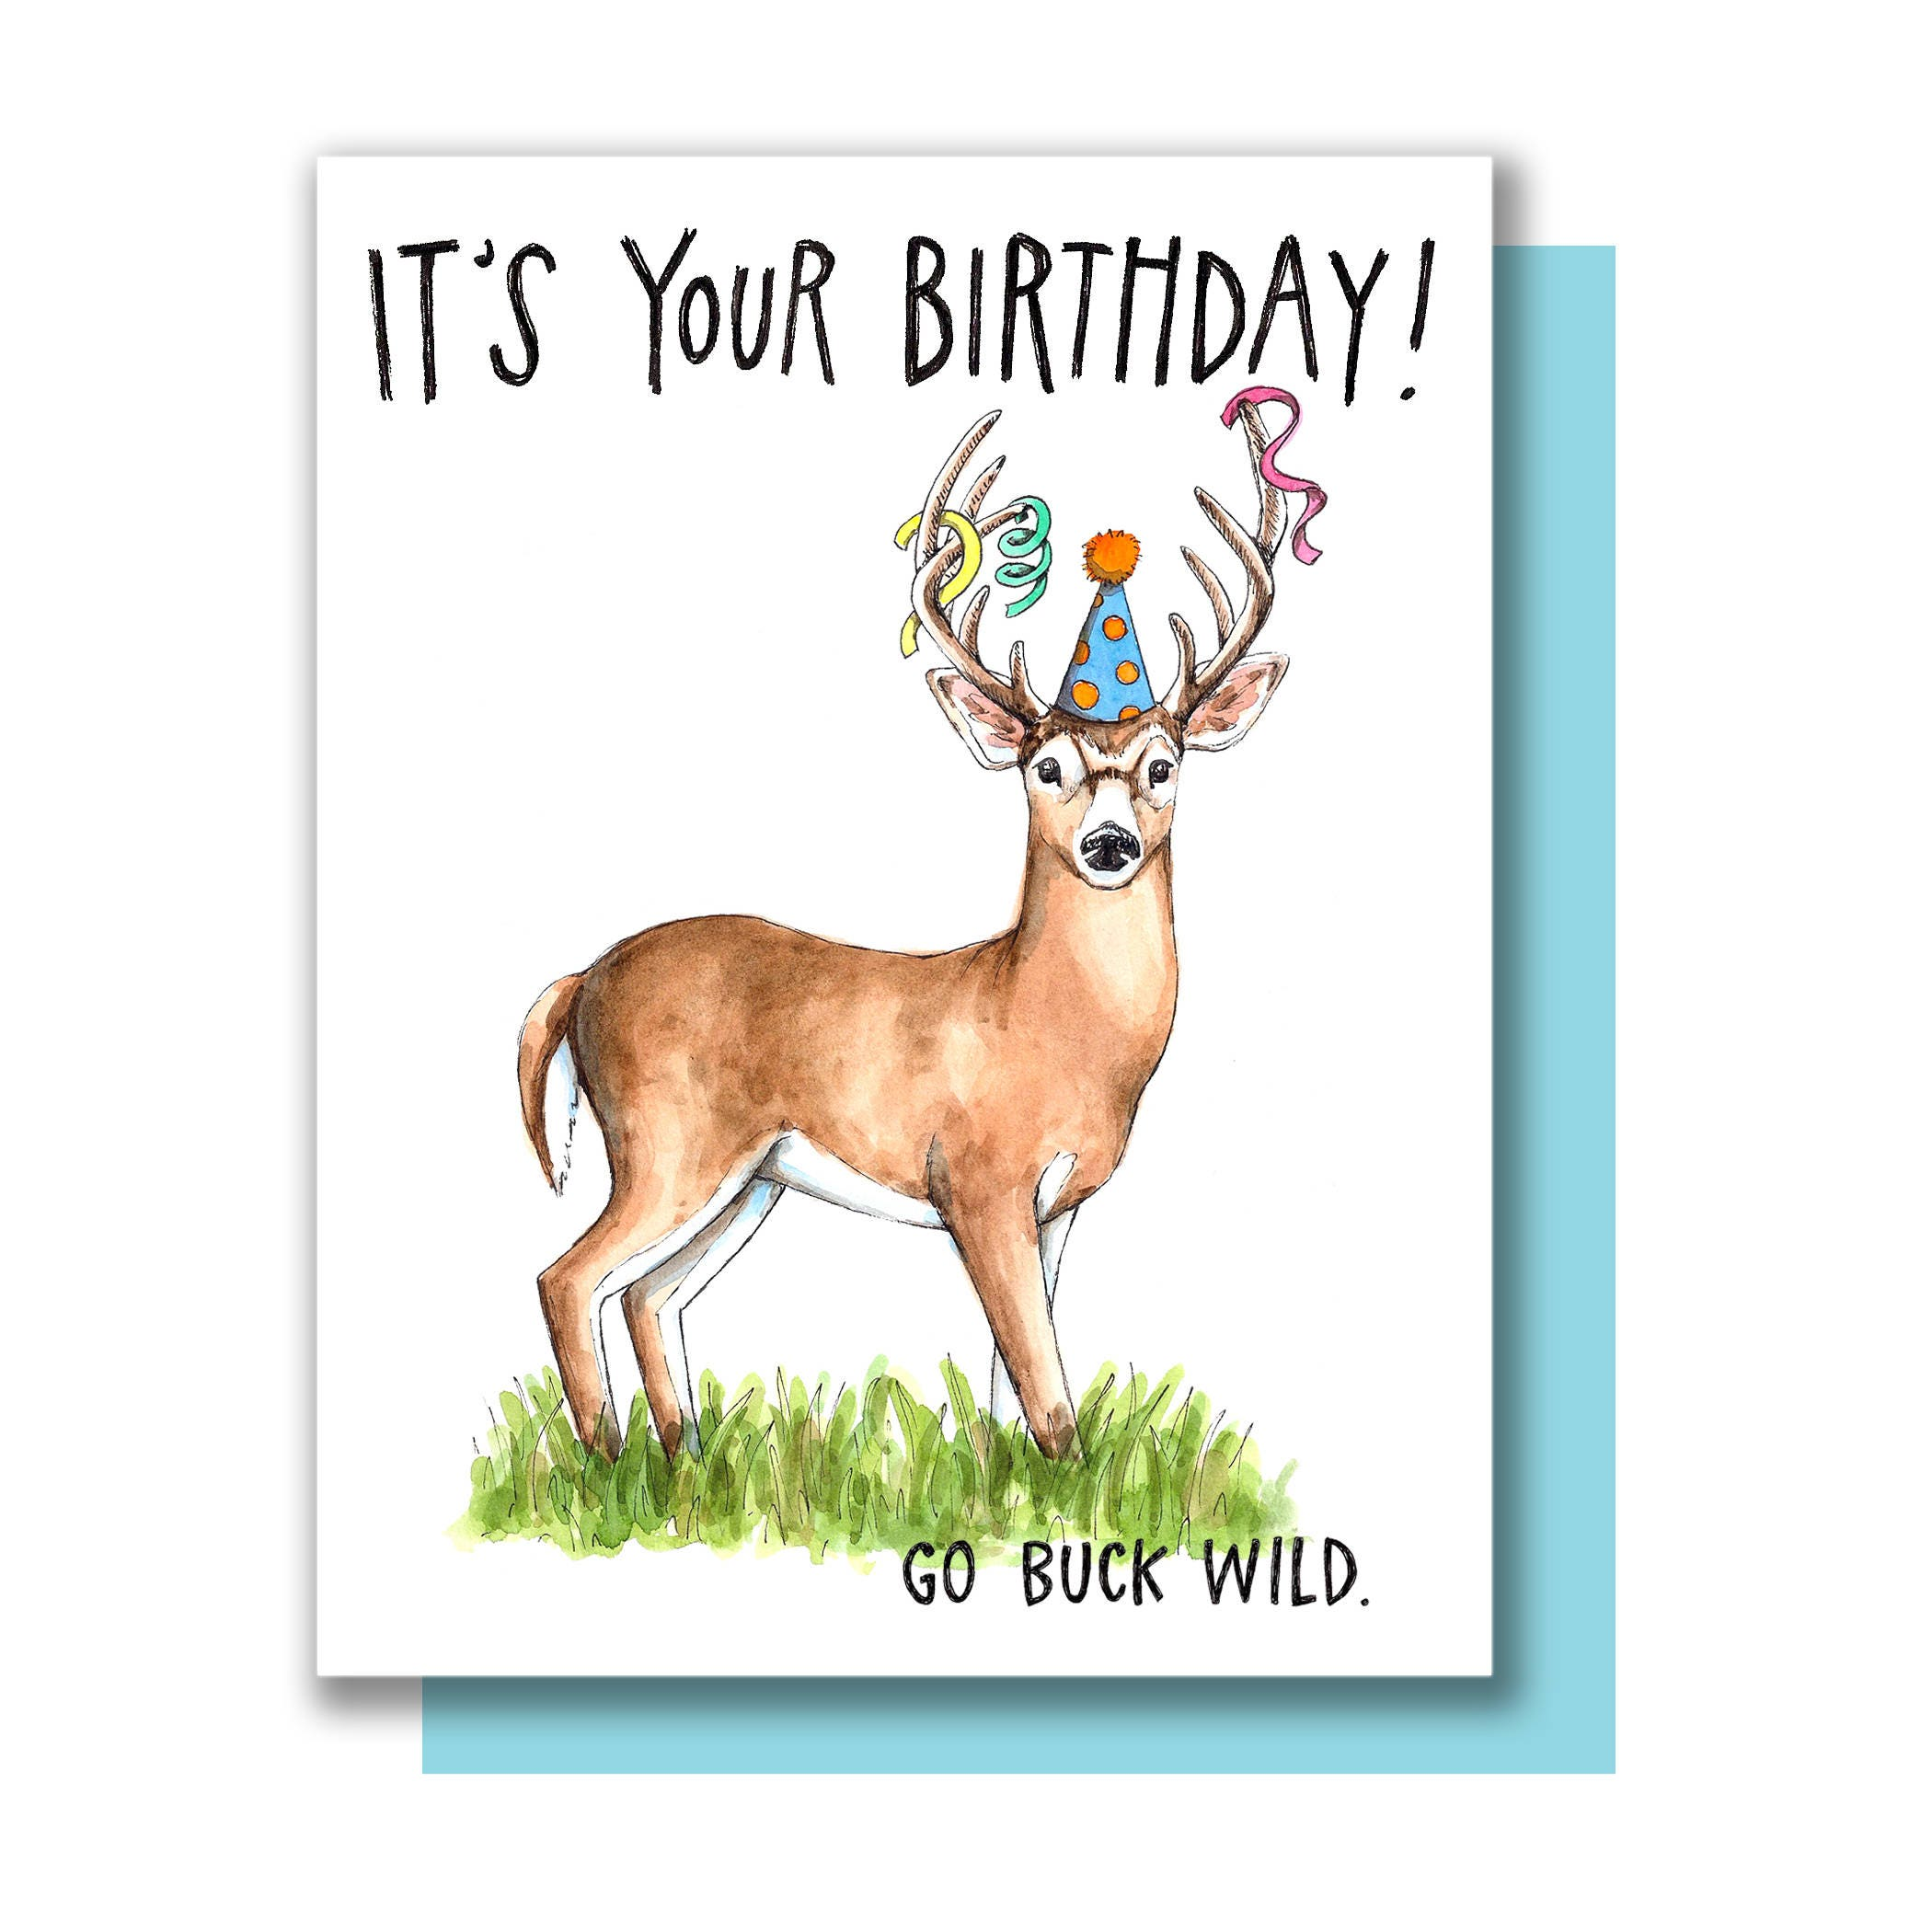 199c89503114 It's Your Birthday Go Buck Wild Happy Birthday Deer Card